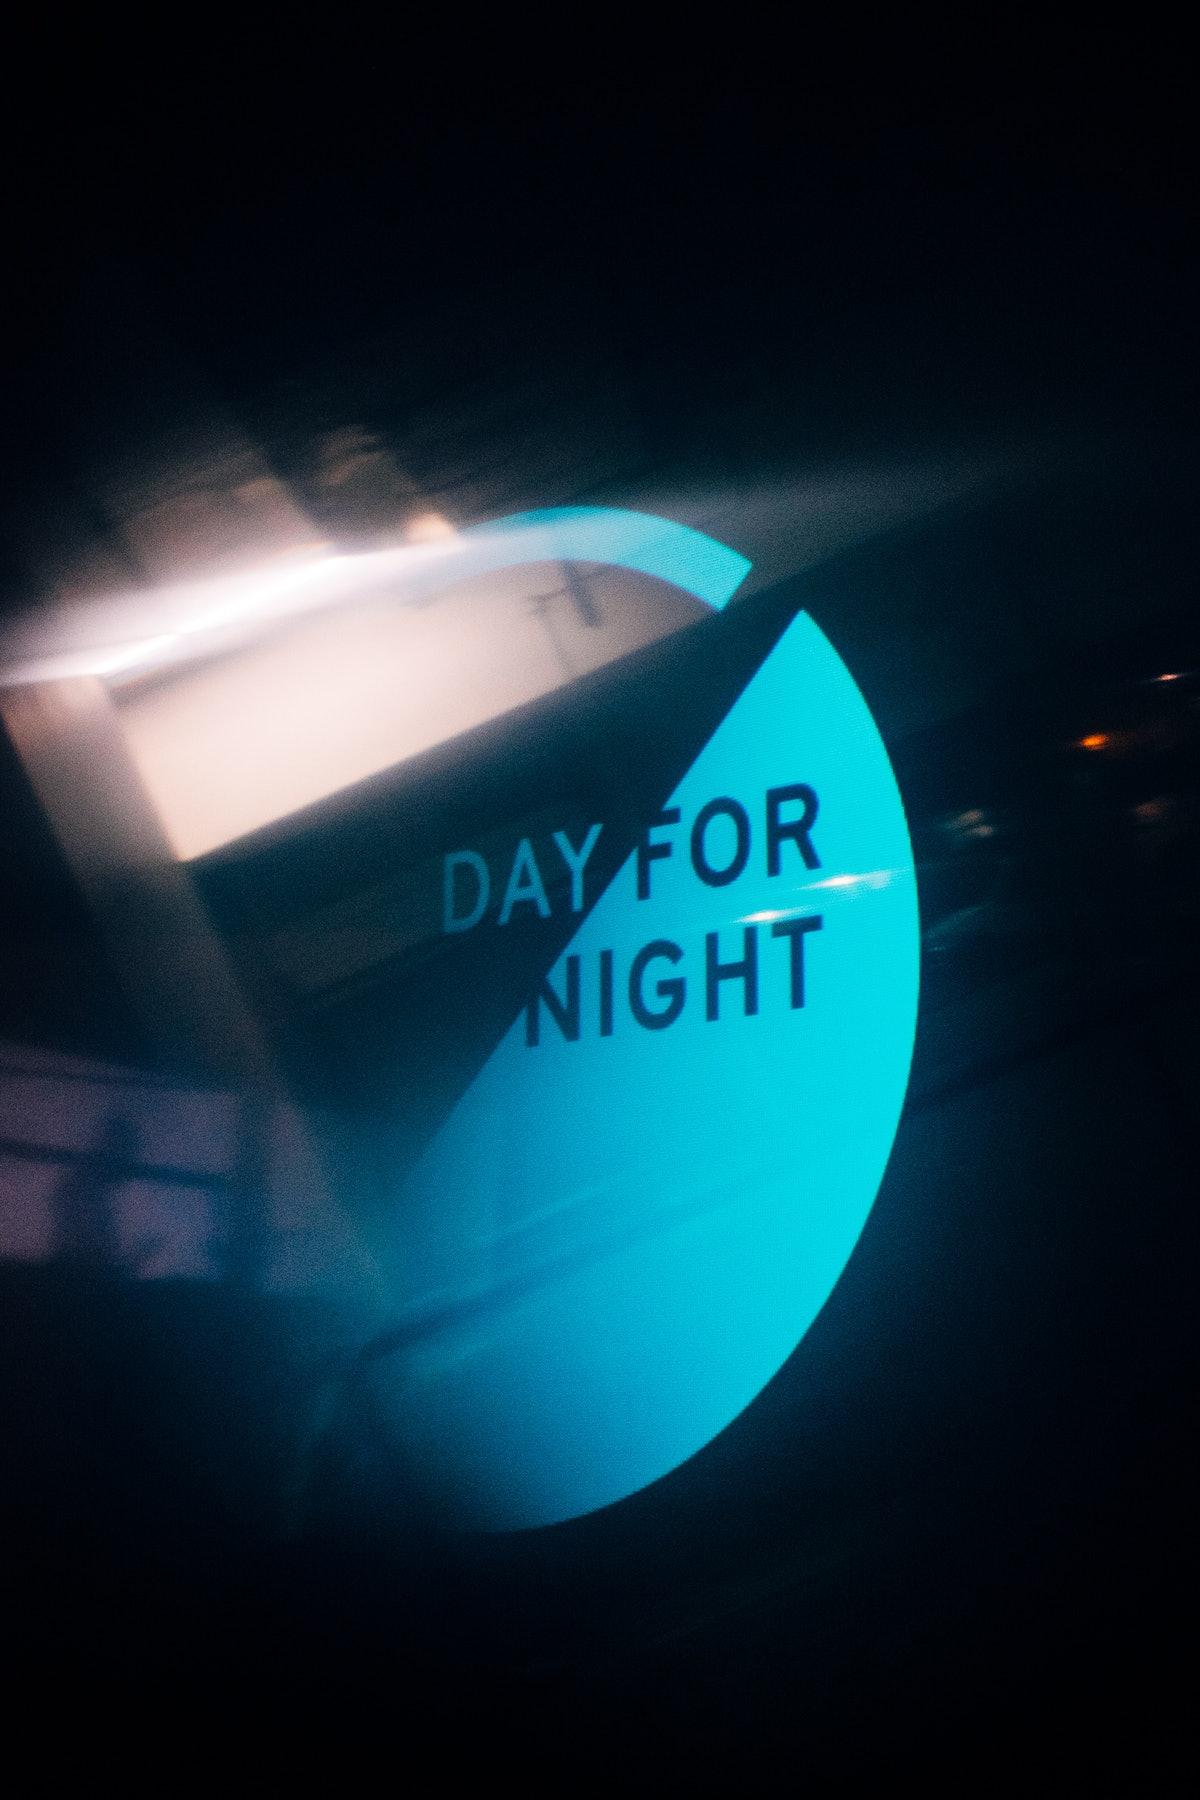 DayForNight_12.16.16_CS-16.jpg